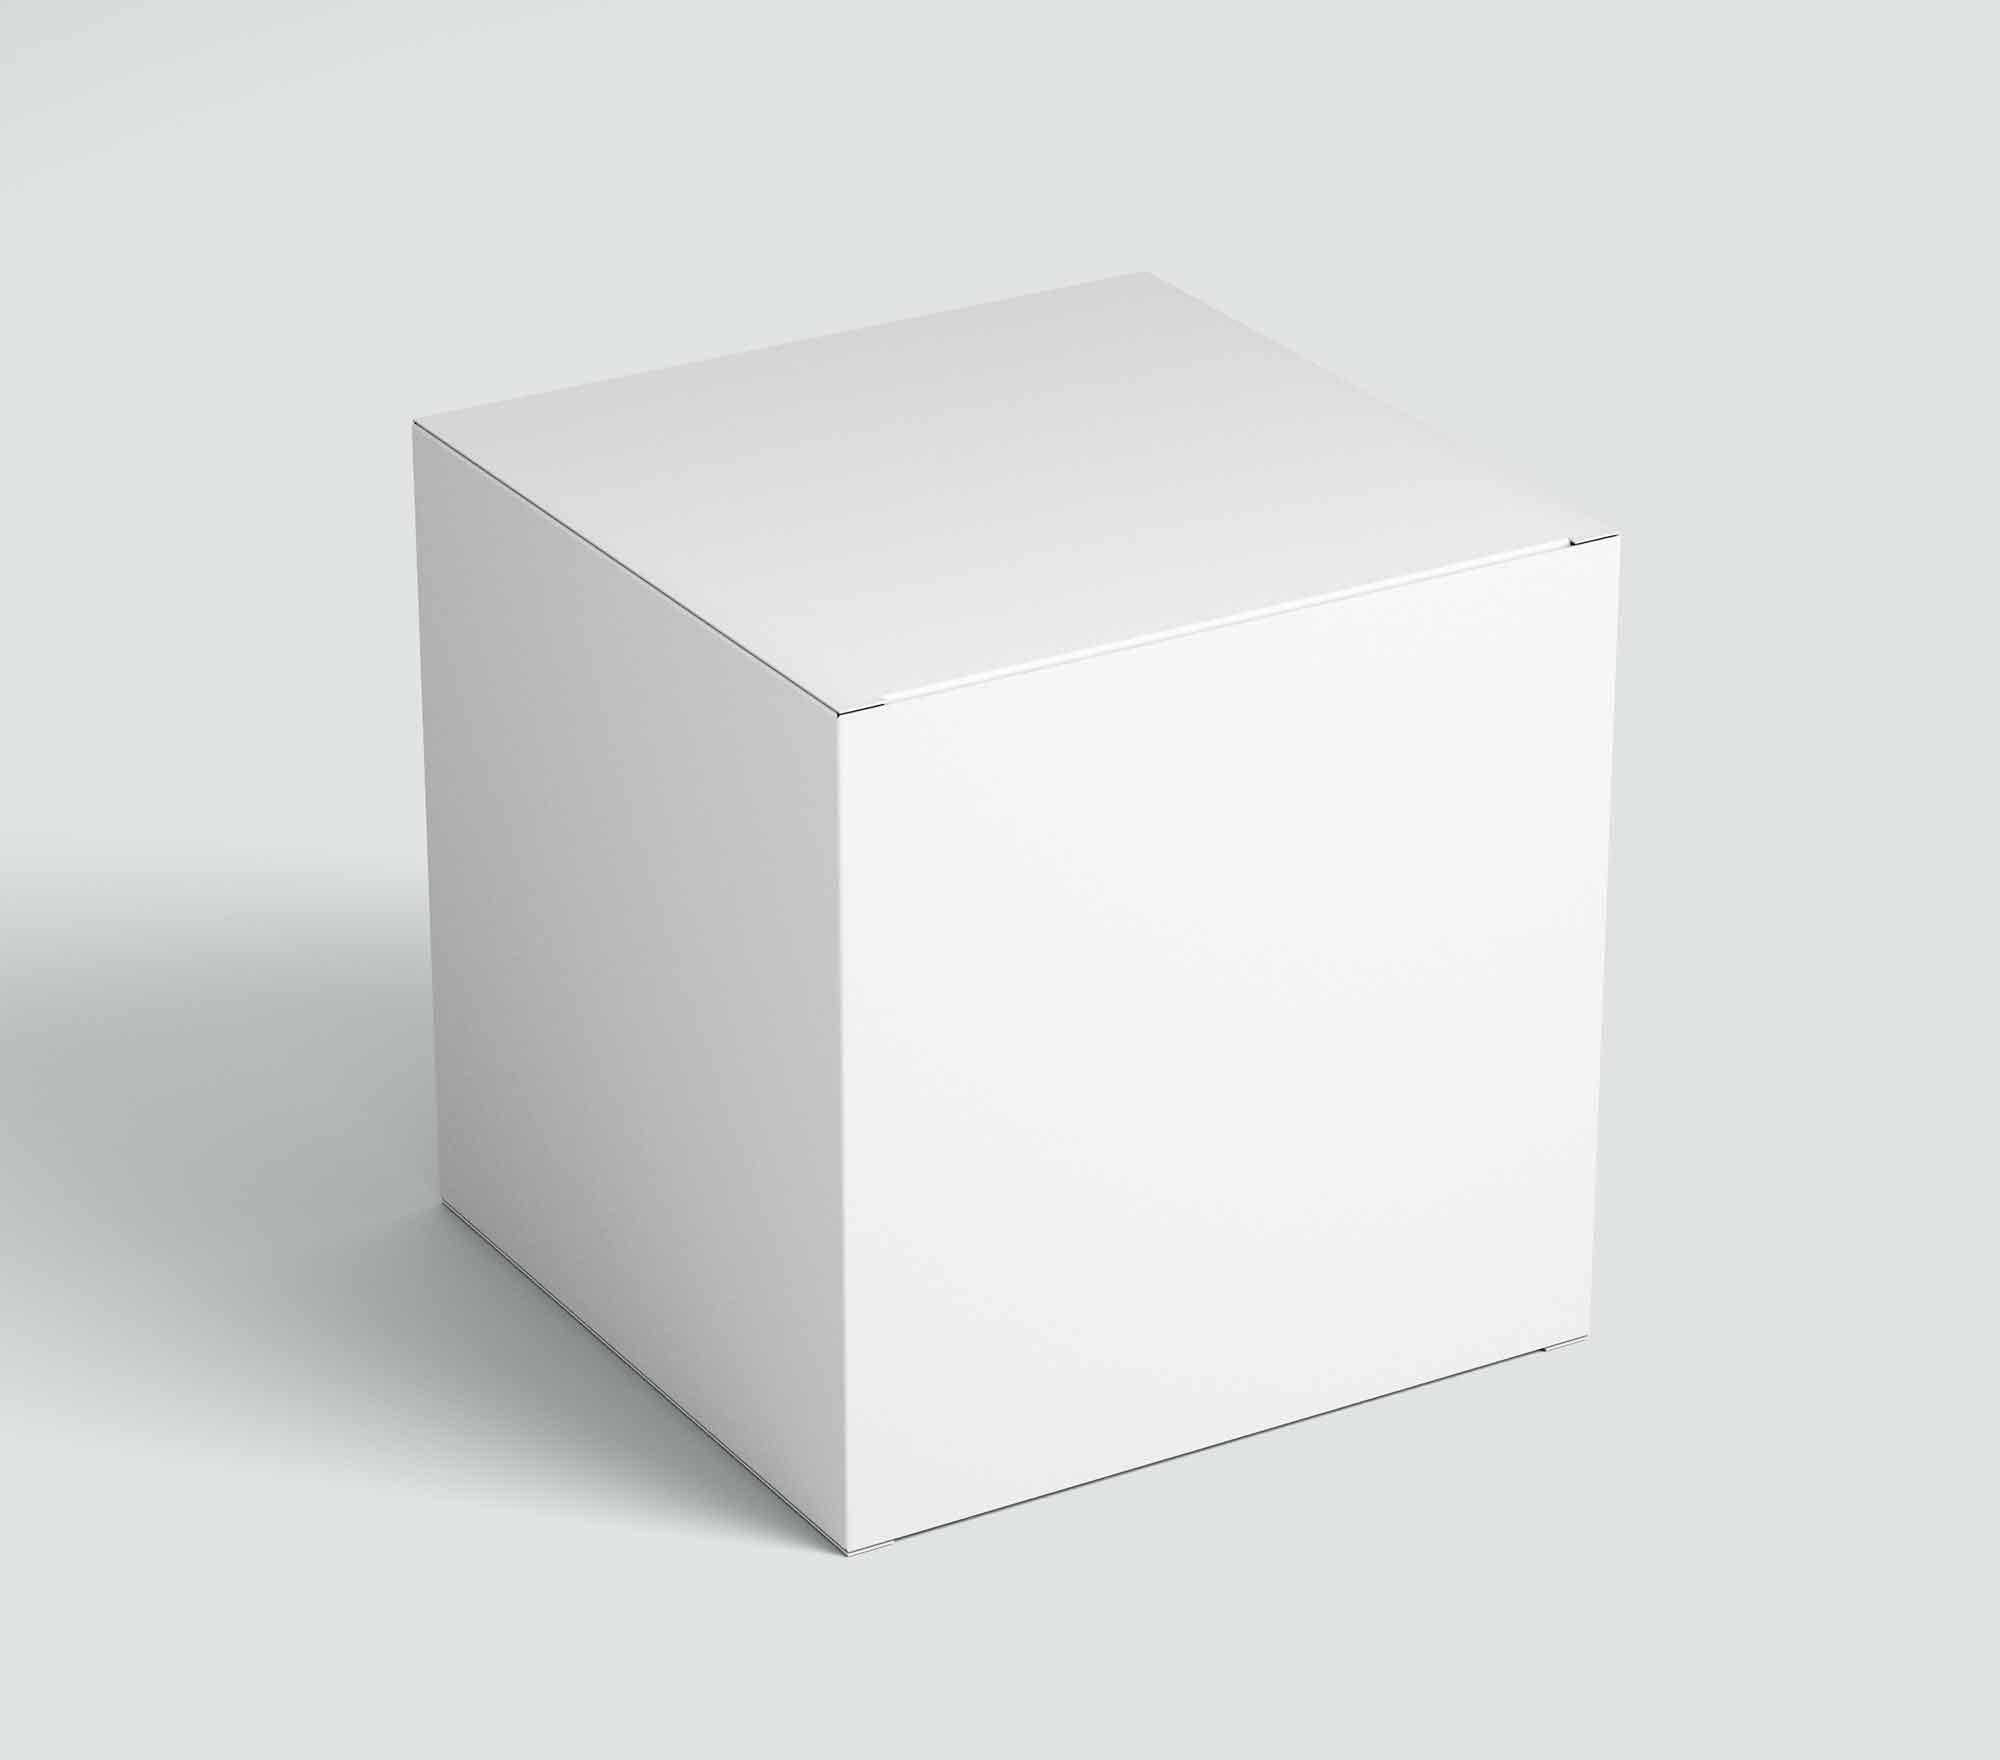 Square Perspective Box Mockup 2